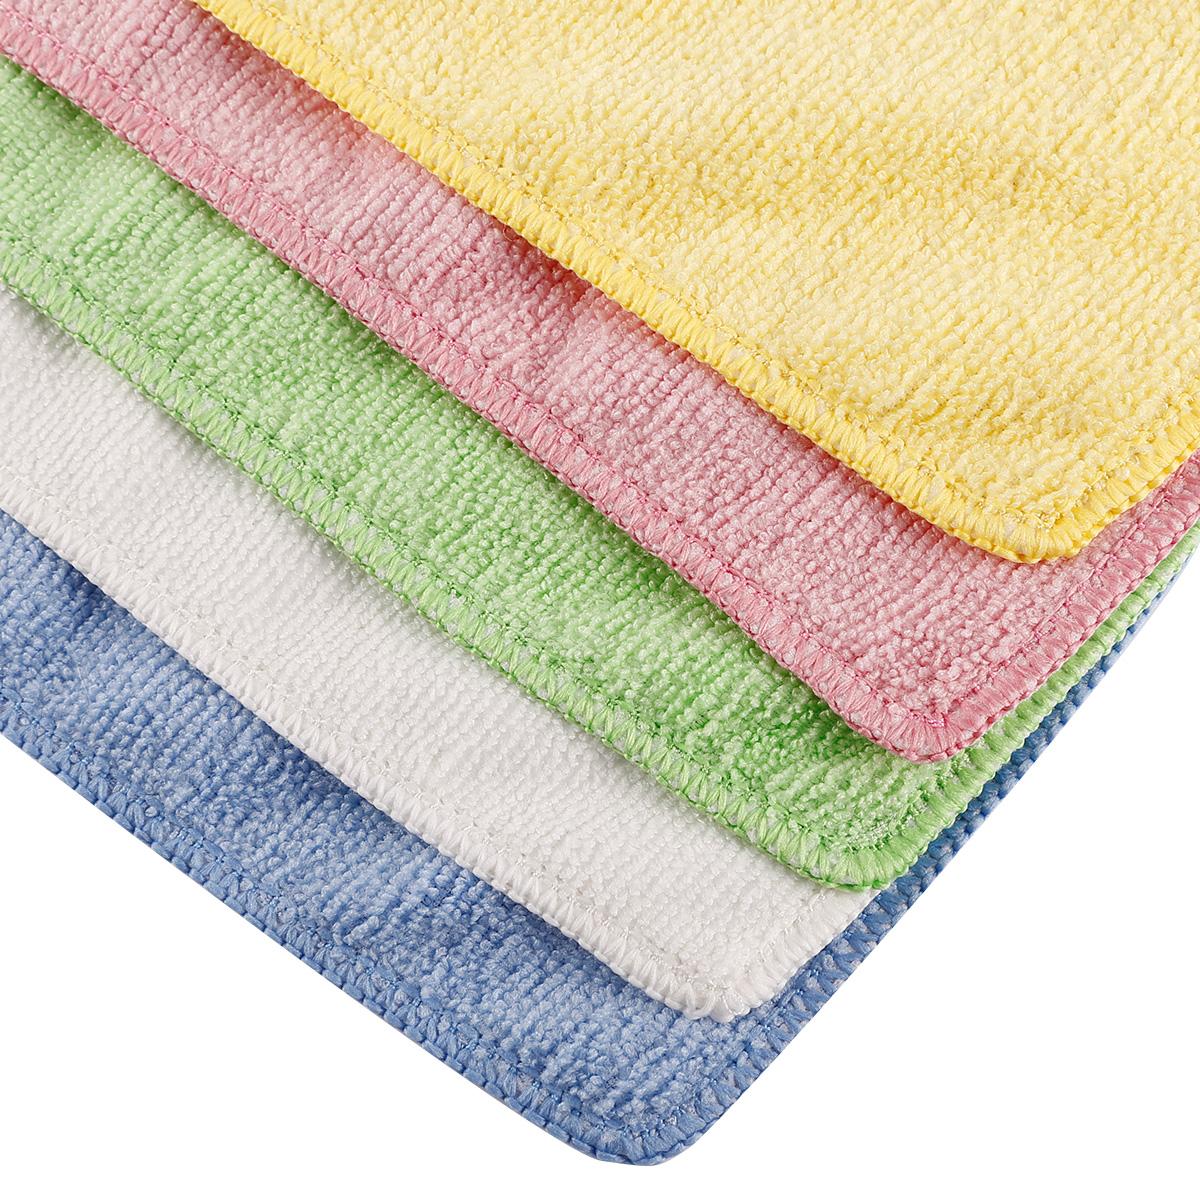 Microfiber Cloth Ebay Uk: 4 / 5 Pack Microfibre Cloths Blue Microfiber Large